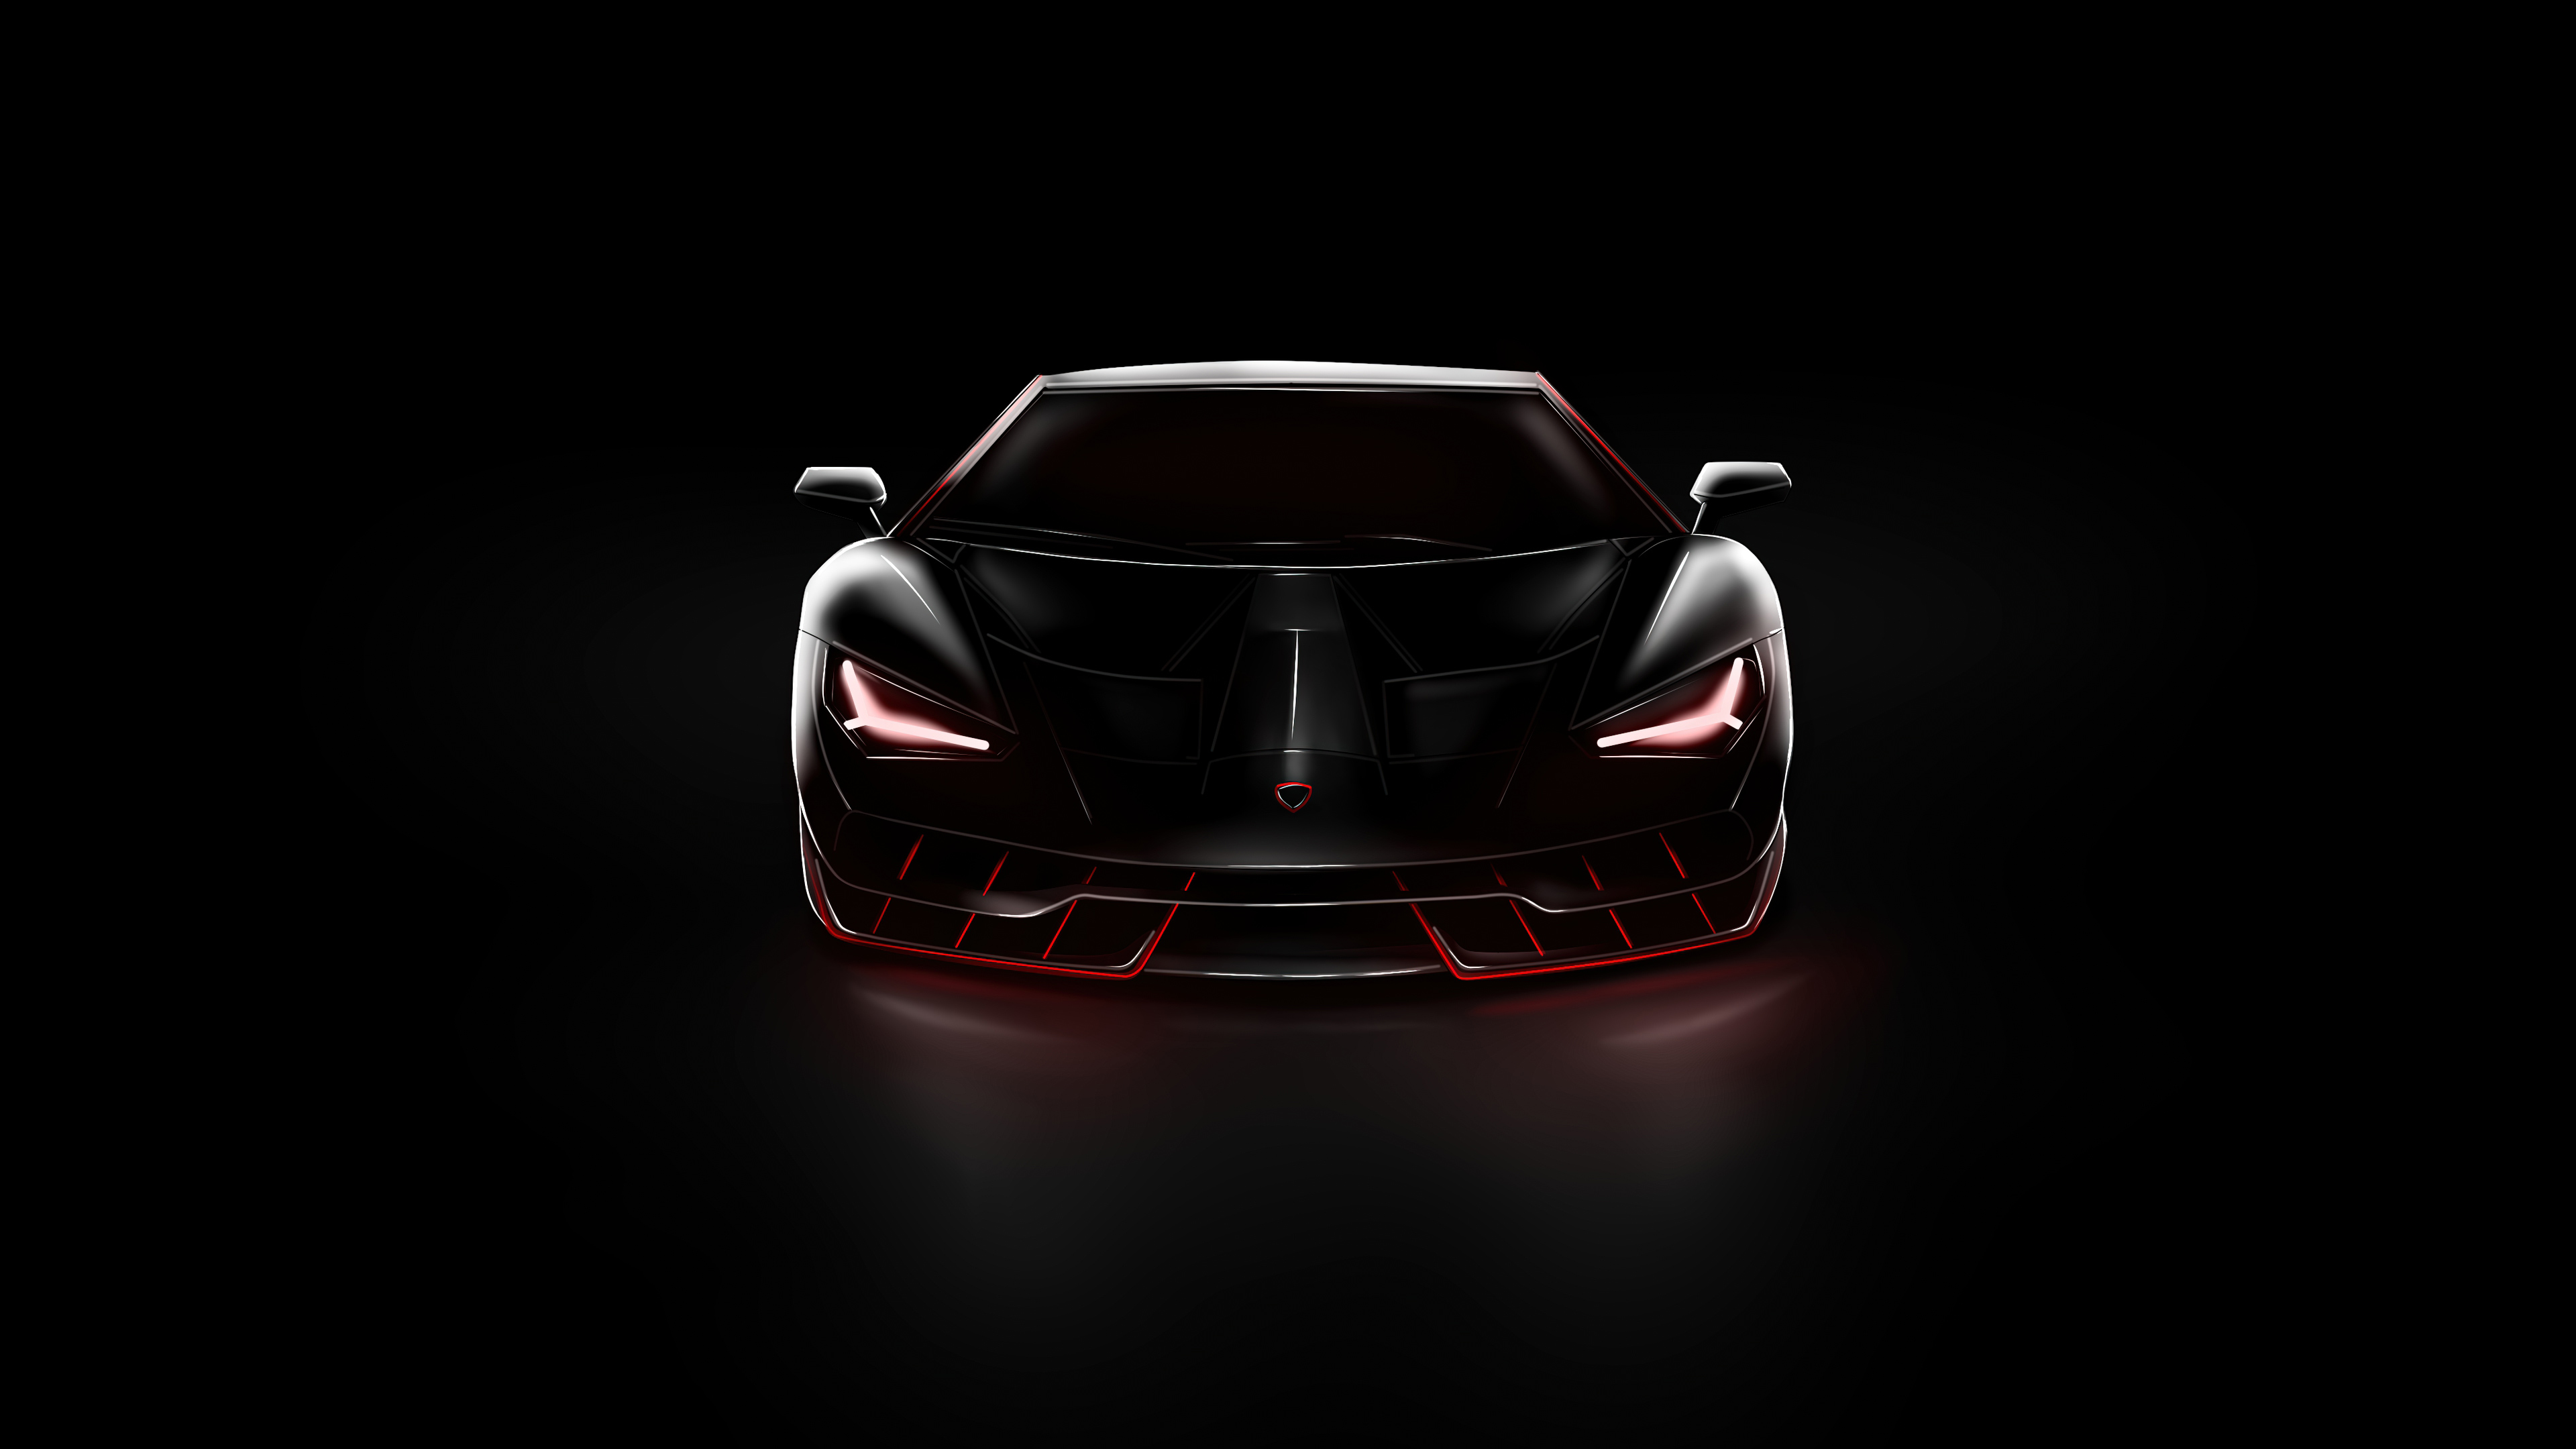 lamborghini centenario 2020 4k 1608907778 - Lamborghini Centenario 2020 4k - Lamborghini Centenario 2020 4k wallpapers